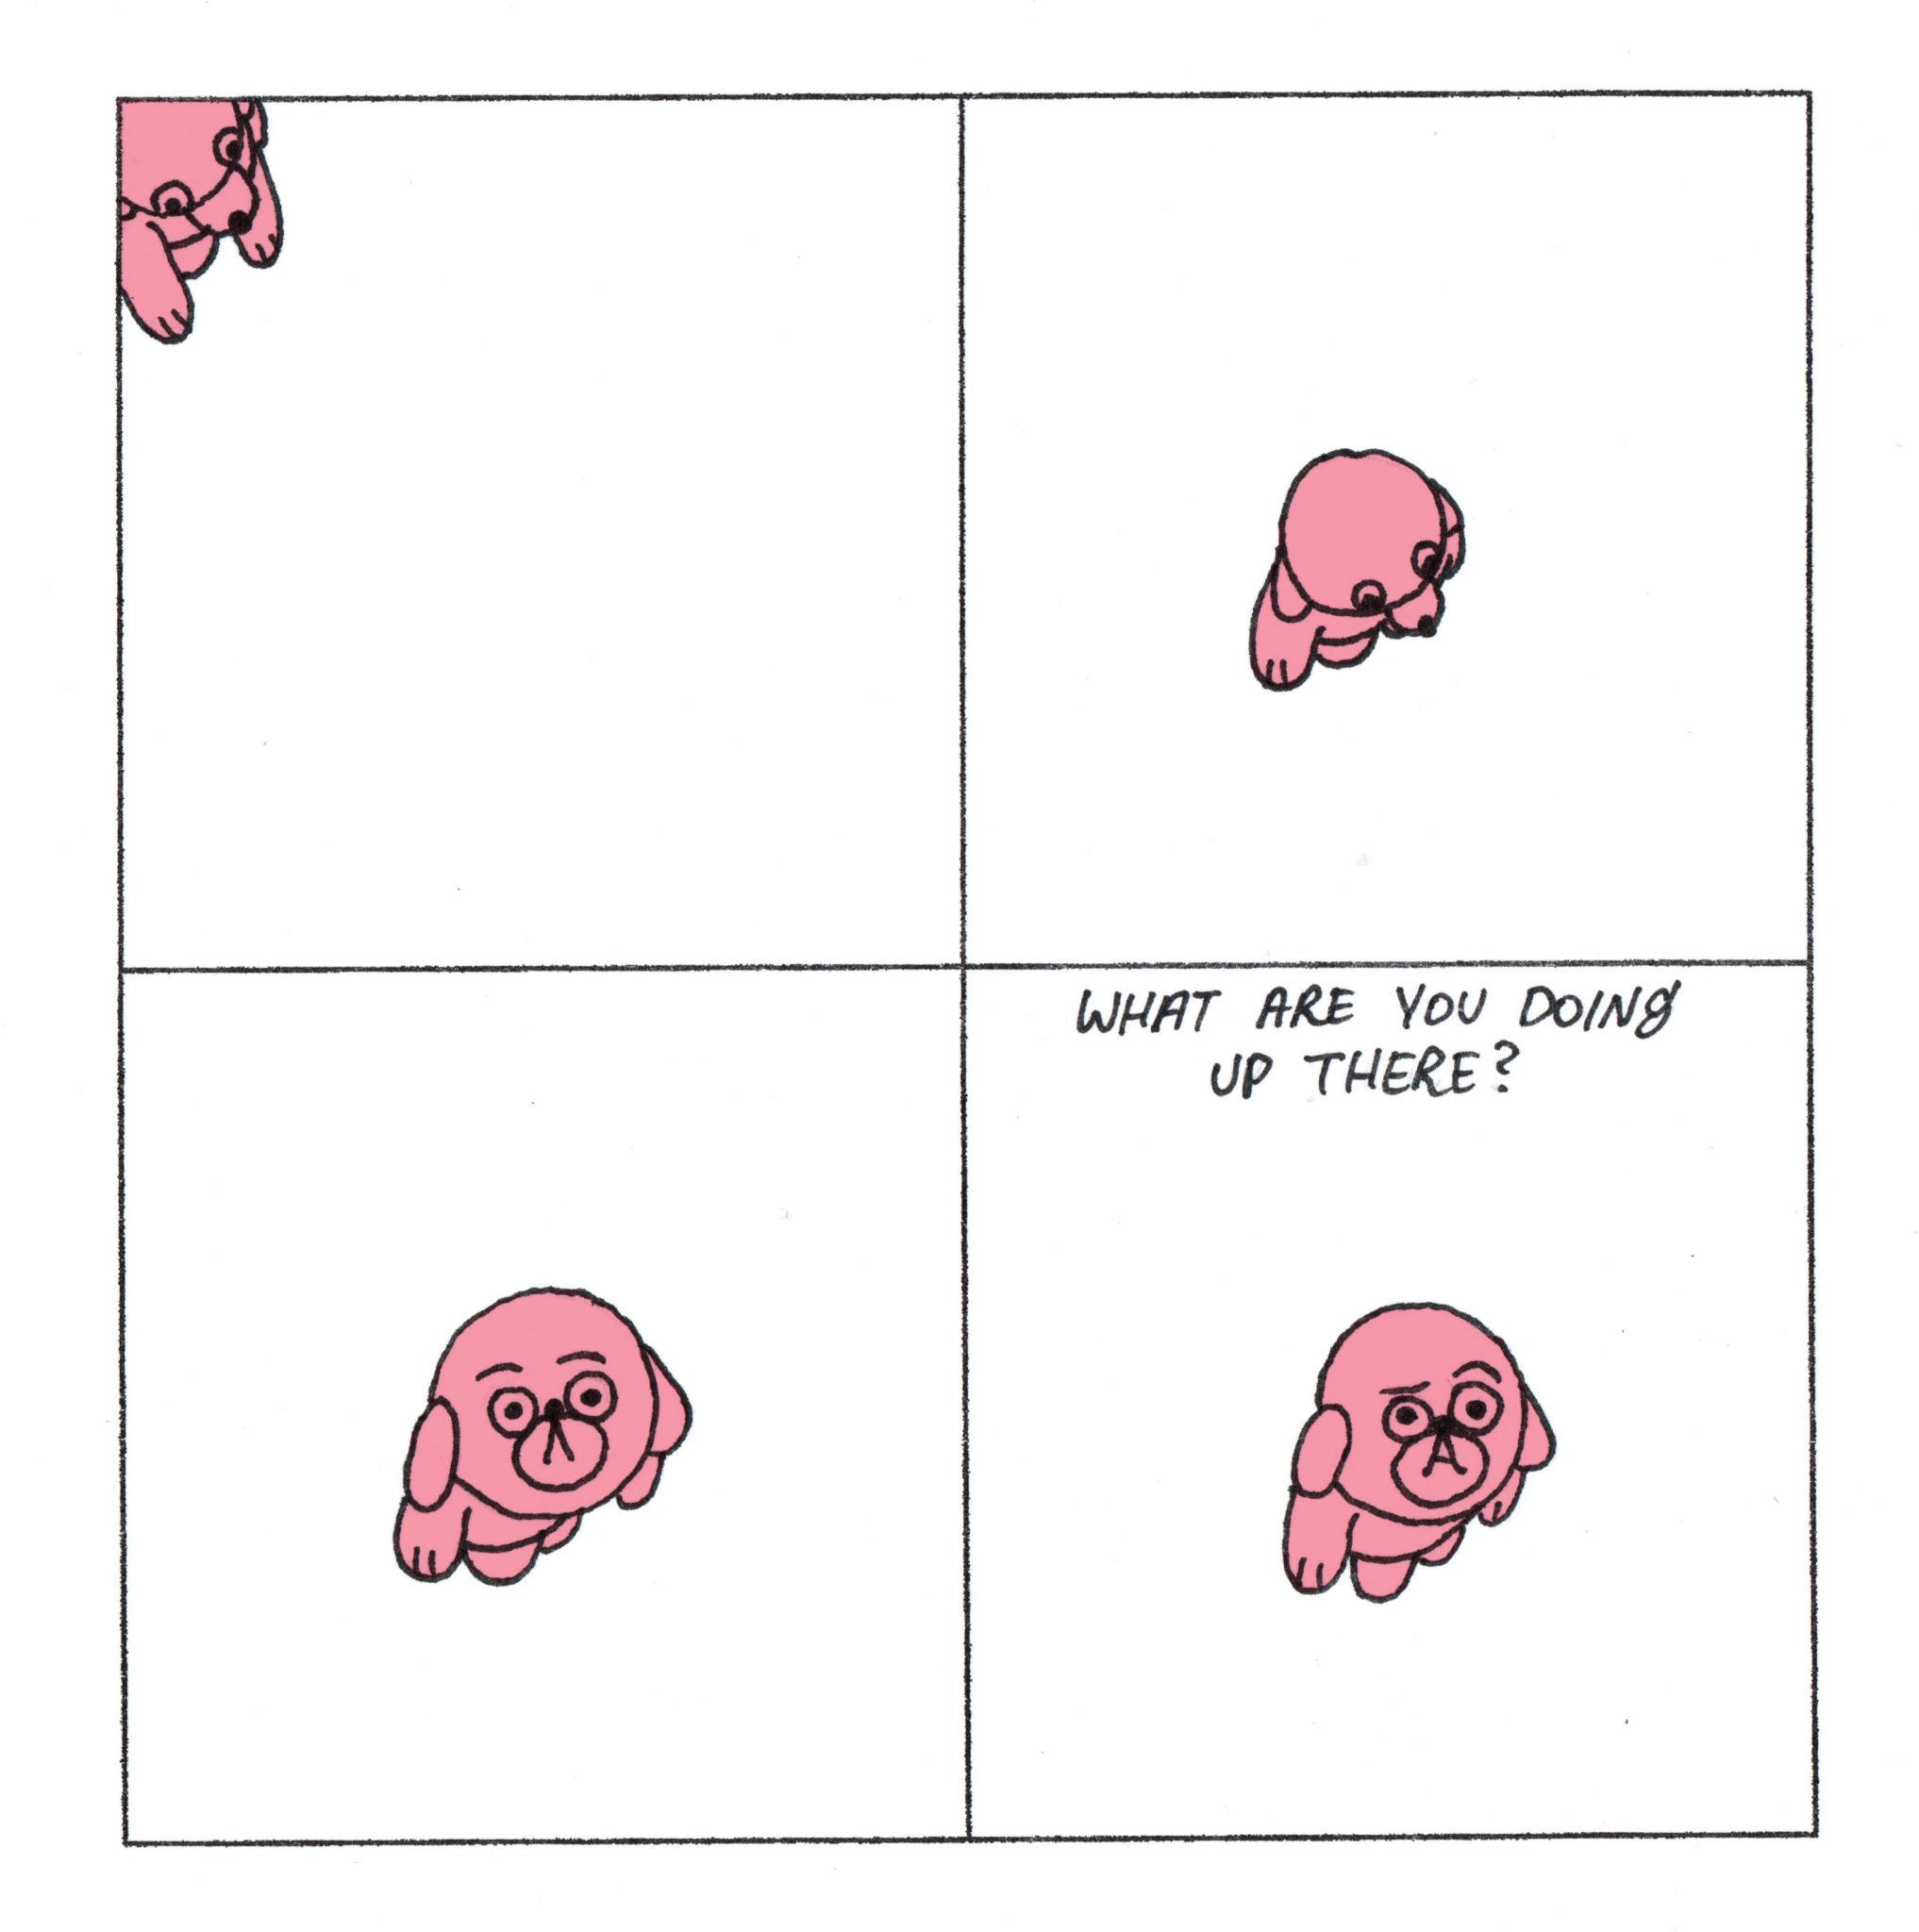 Dog Comics 141-145 - Page 1